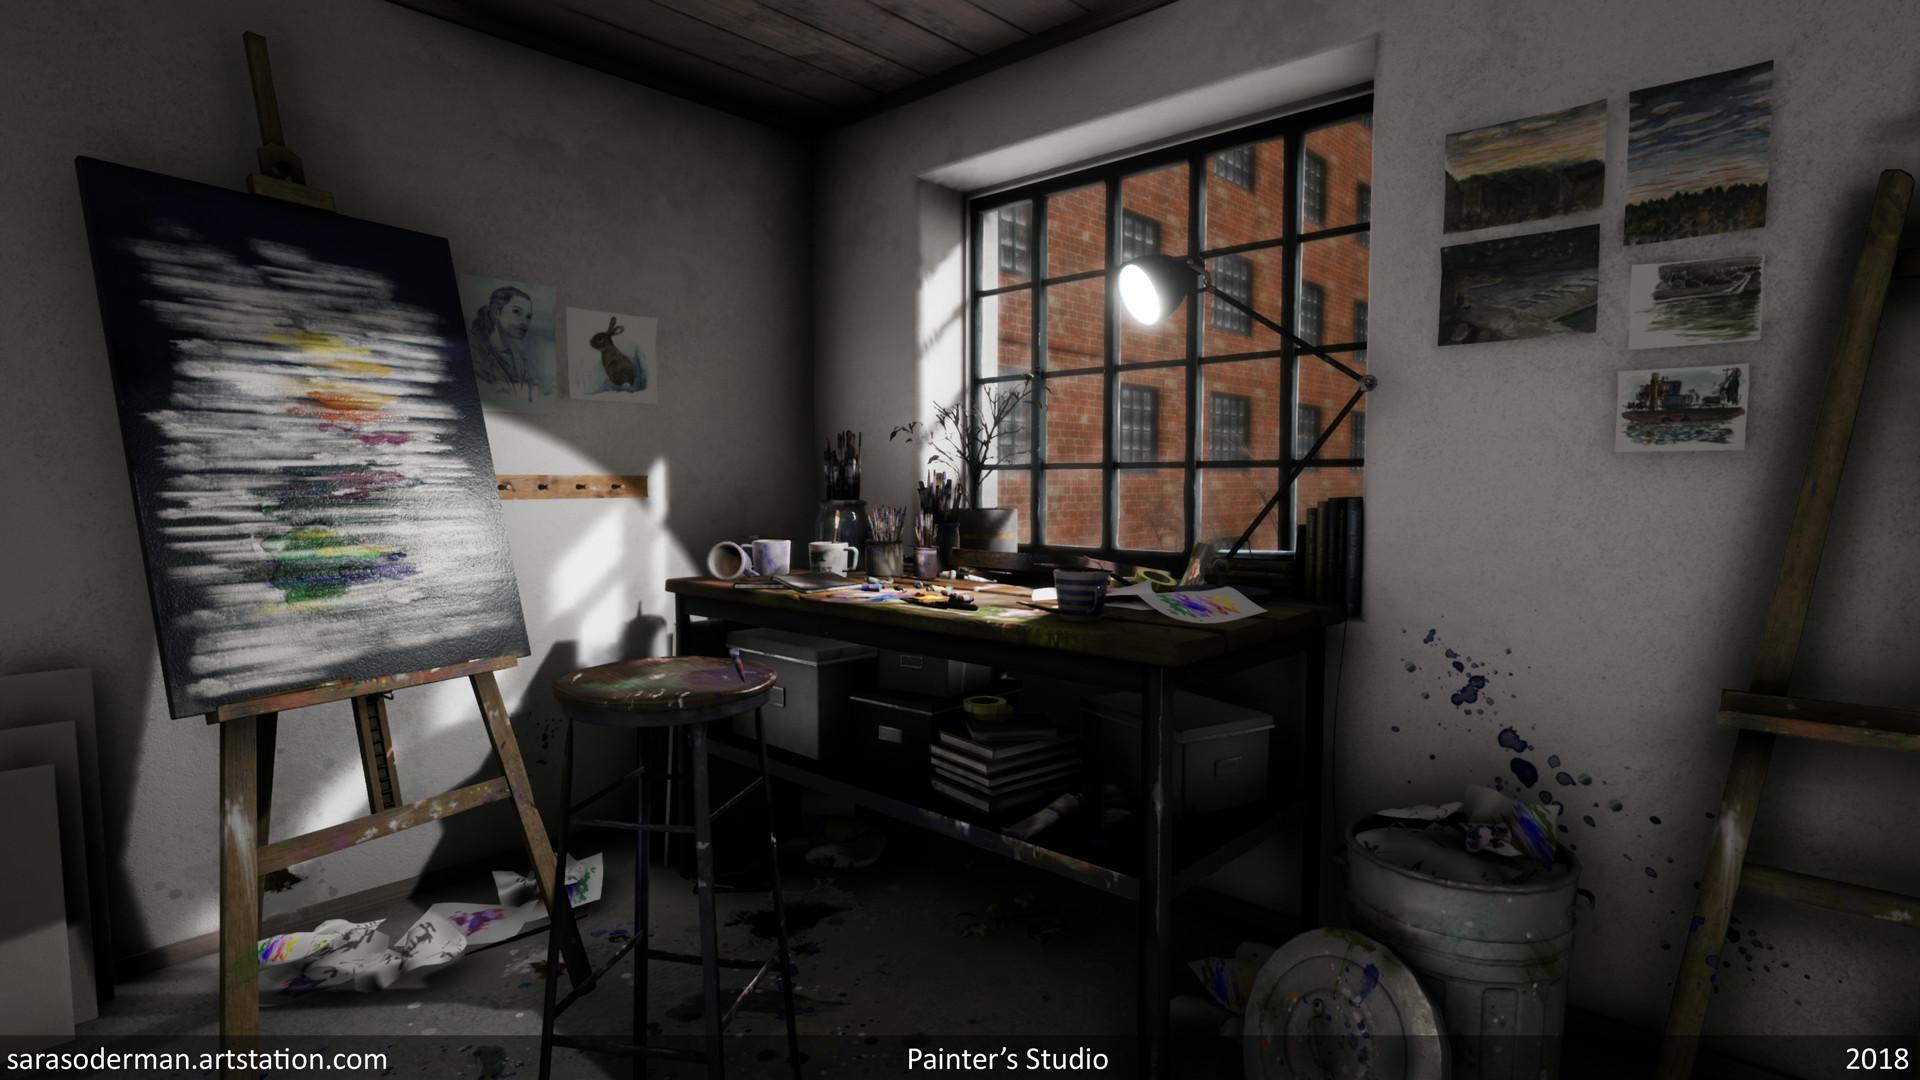 Sara soderman paintrender 02